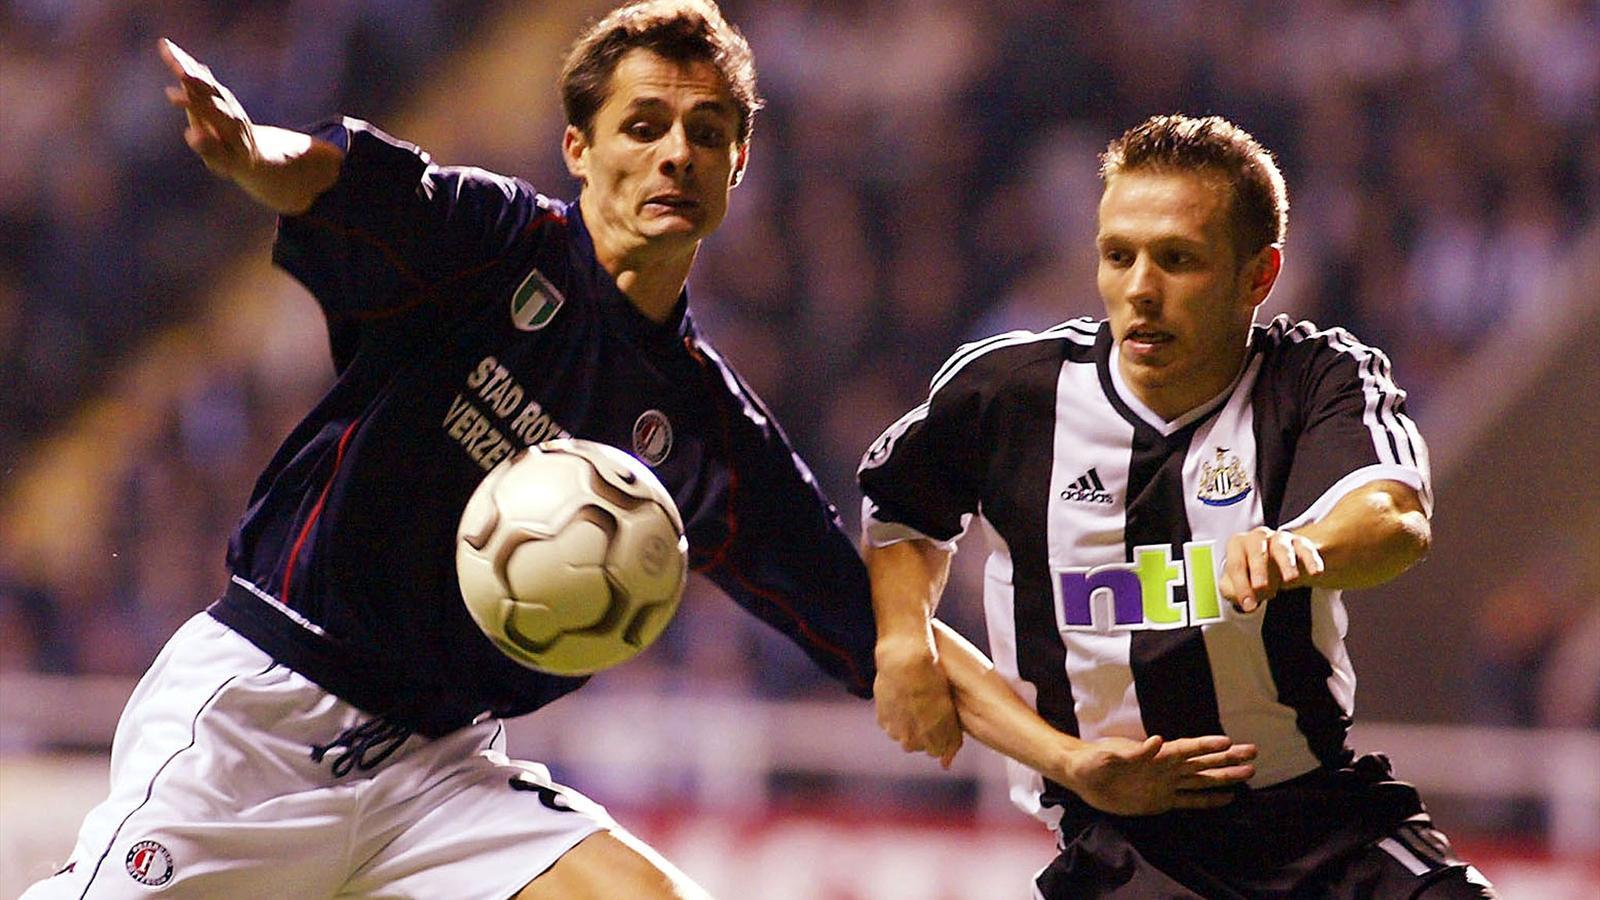 Newcastle United's Craig Bellamy (R) is challenged by Feyenoord's Kees